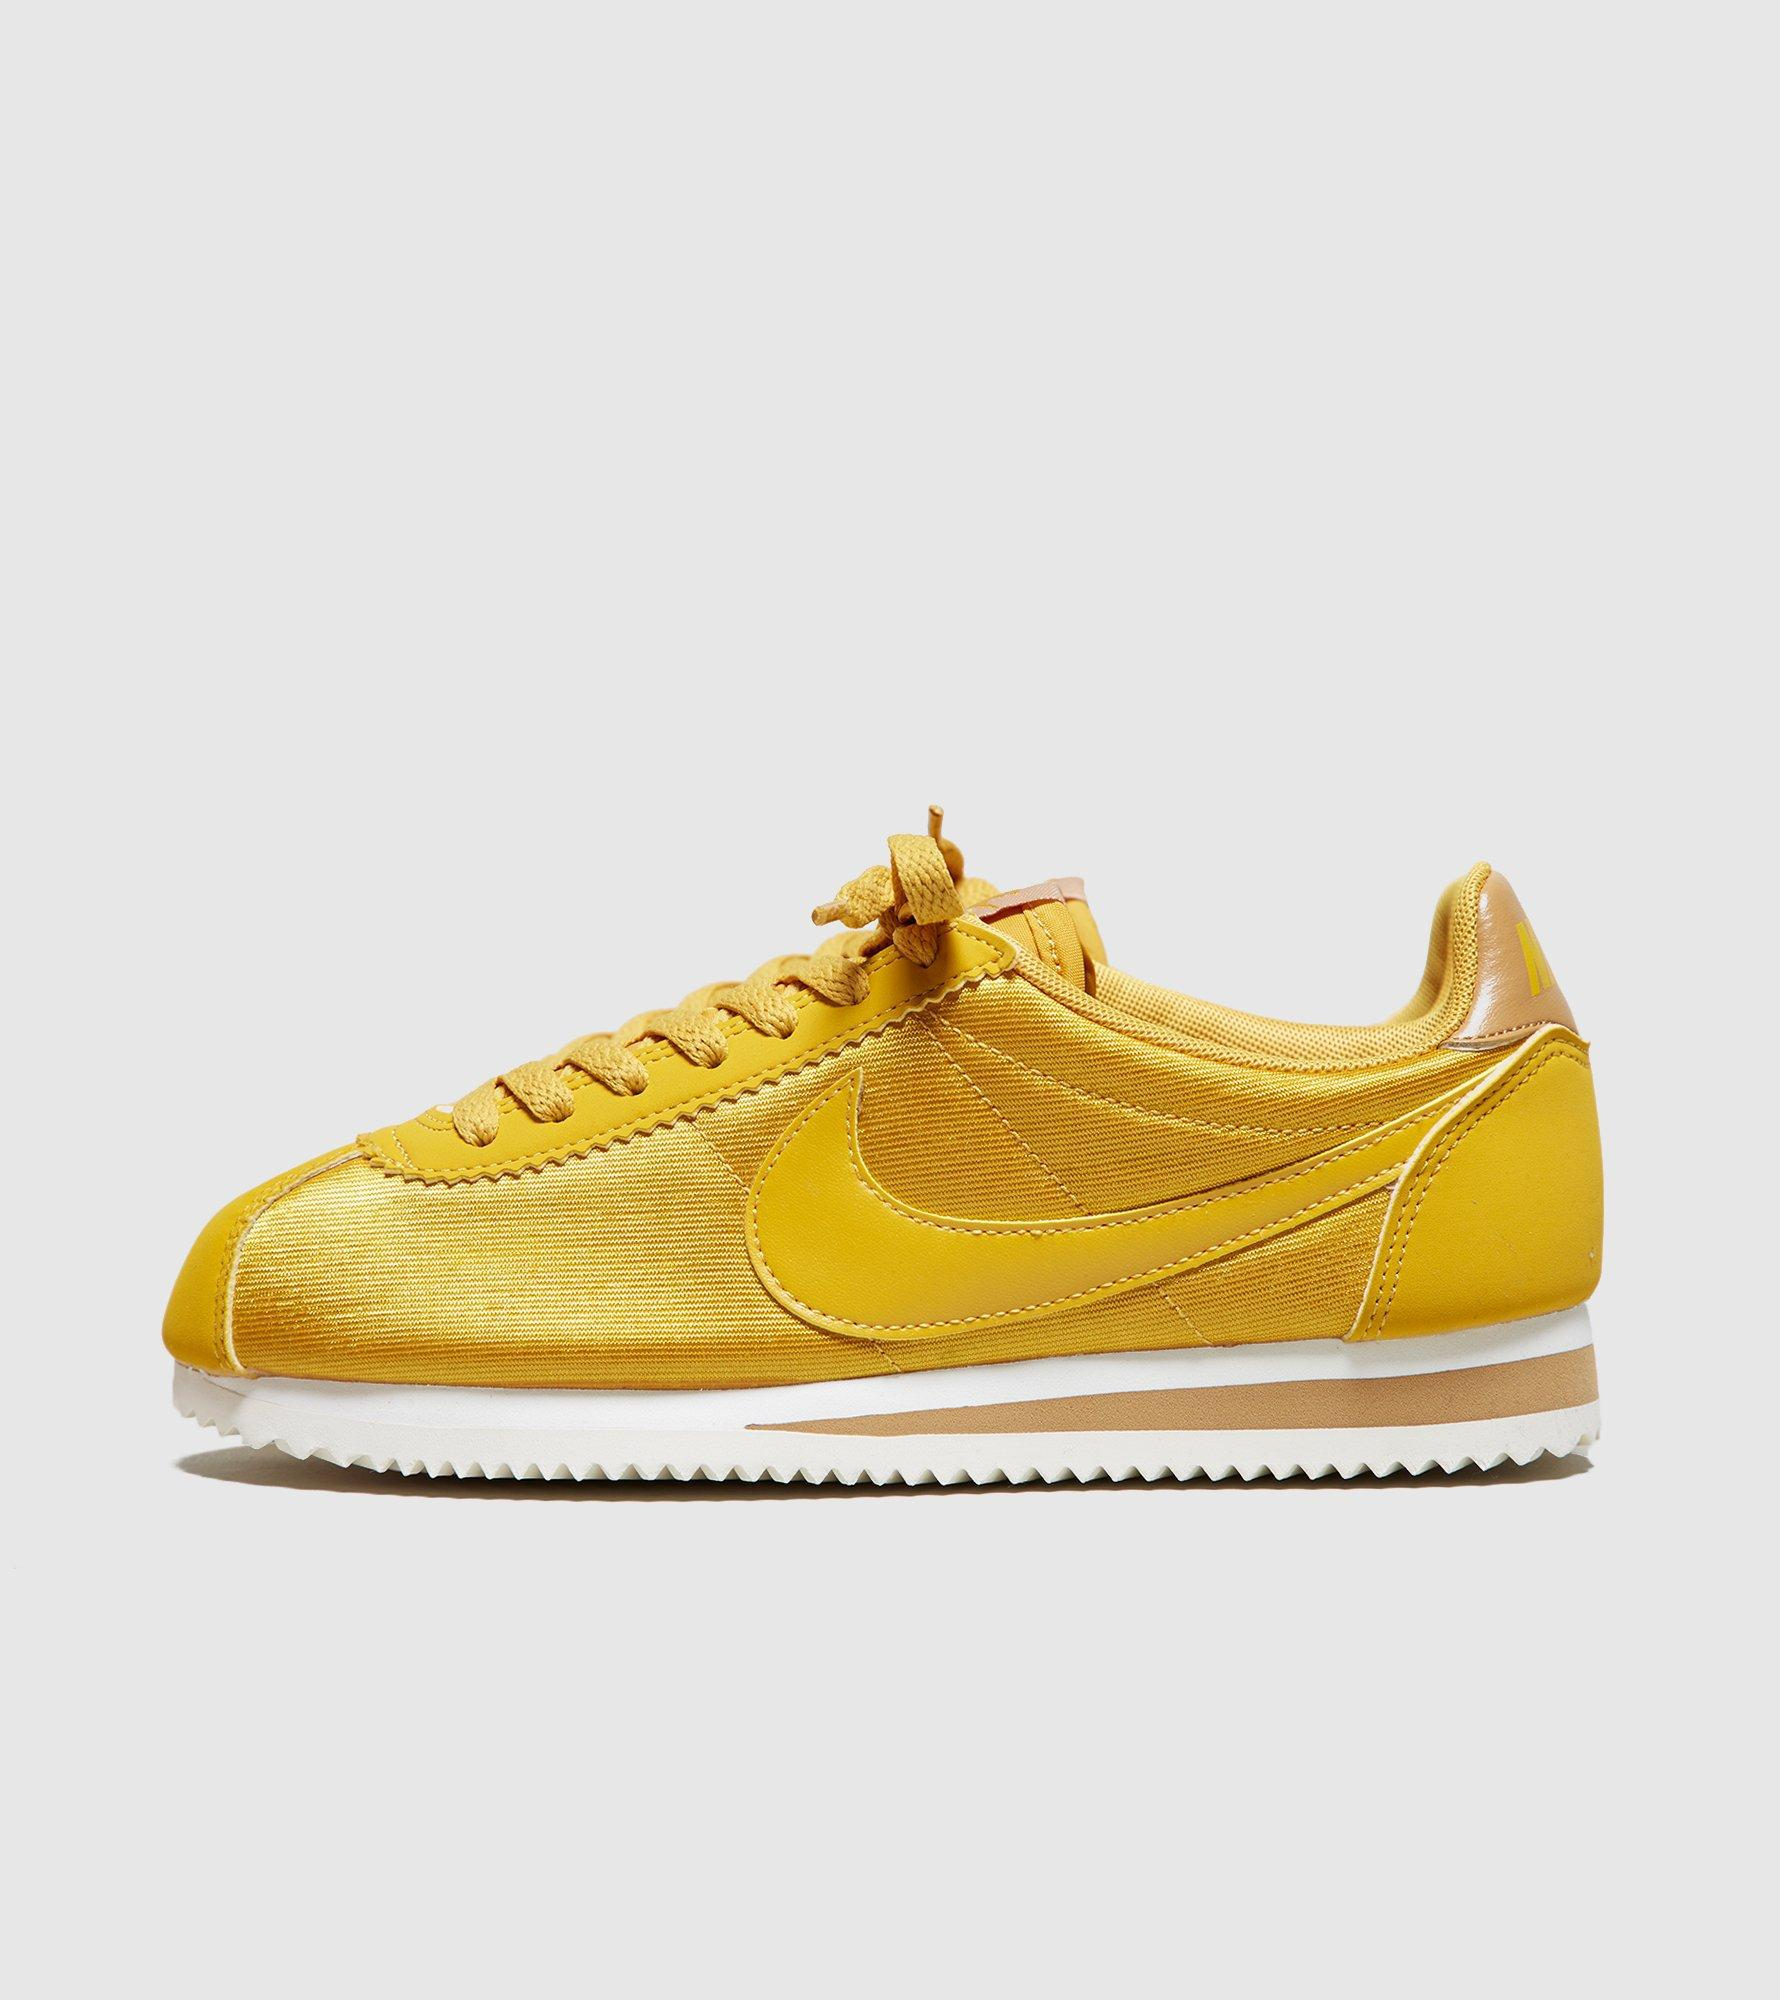 nike cortez womens yellow